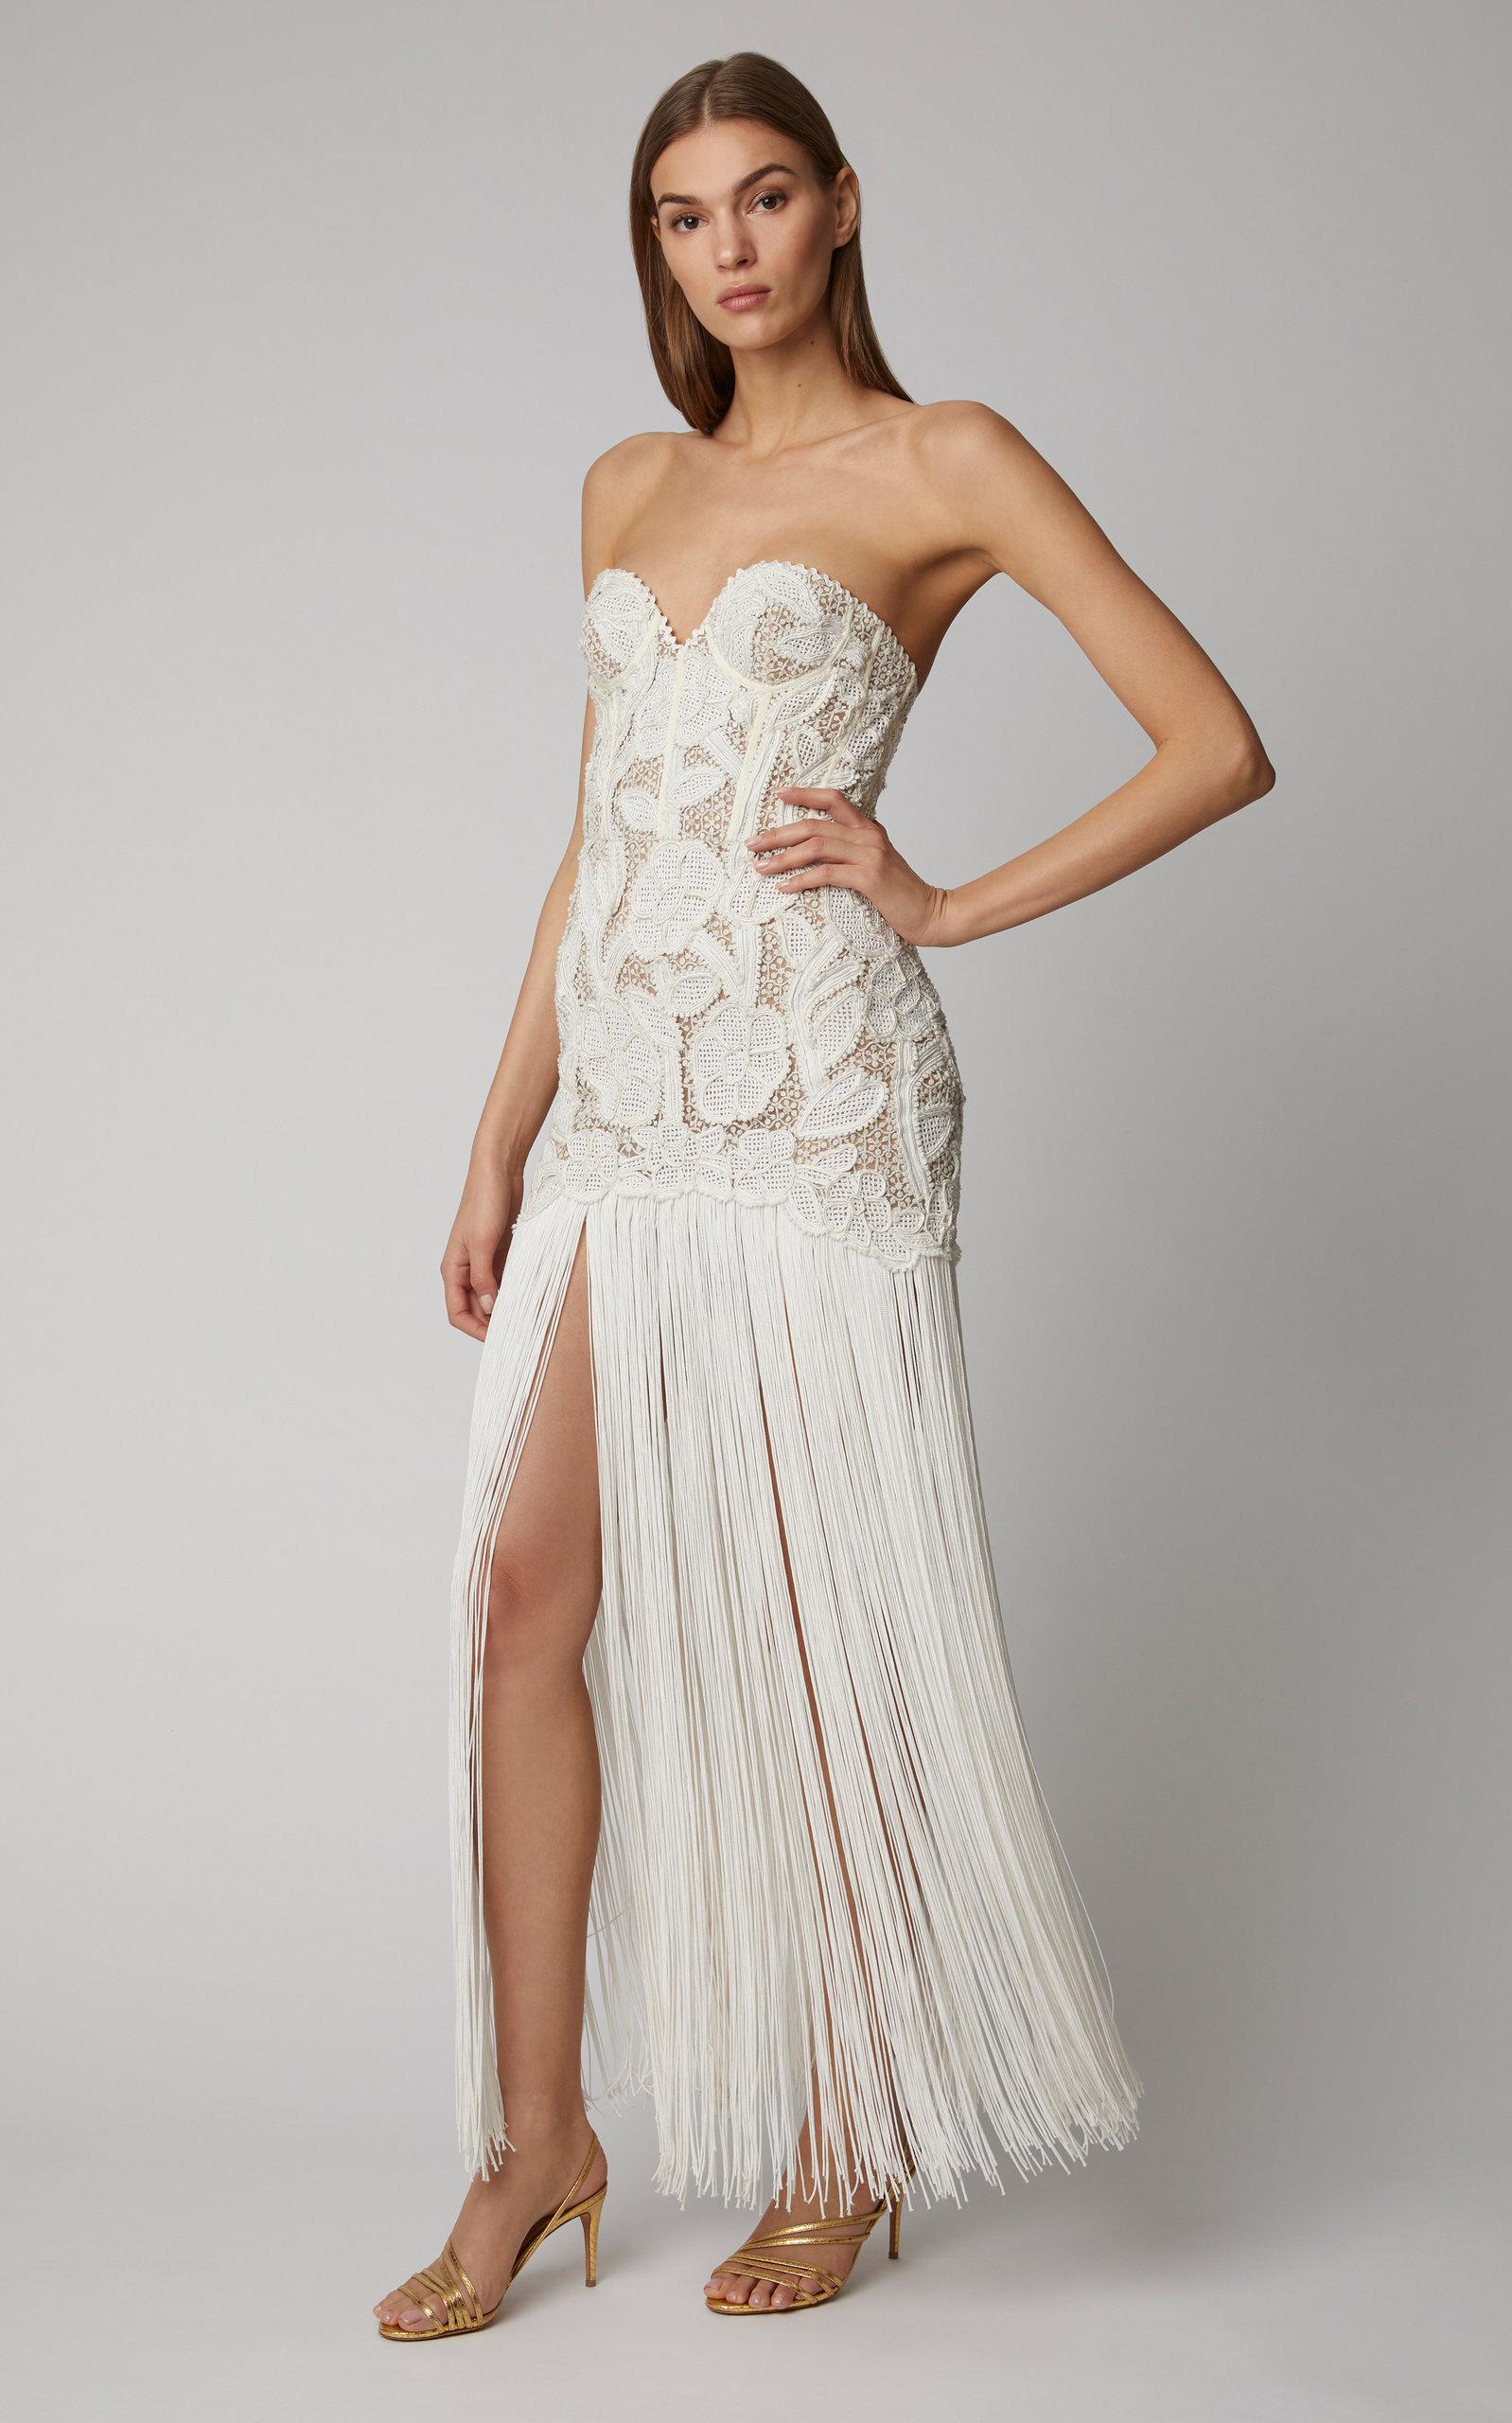 Fringed Strapless Guipure Lace Gown By Oscar De La Renta Now Available On Moda Operandi Designer White Dresses Lace Gown Fringe Flapper Dress [ 2560 x 1598 Pixel ]